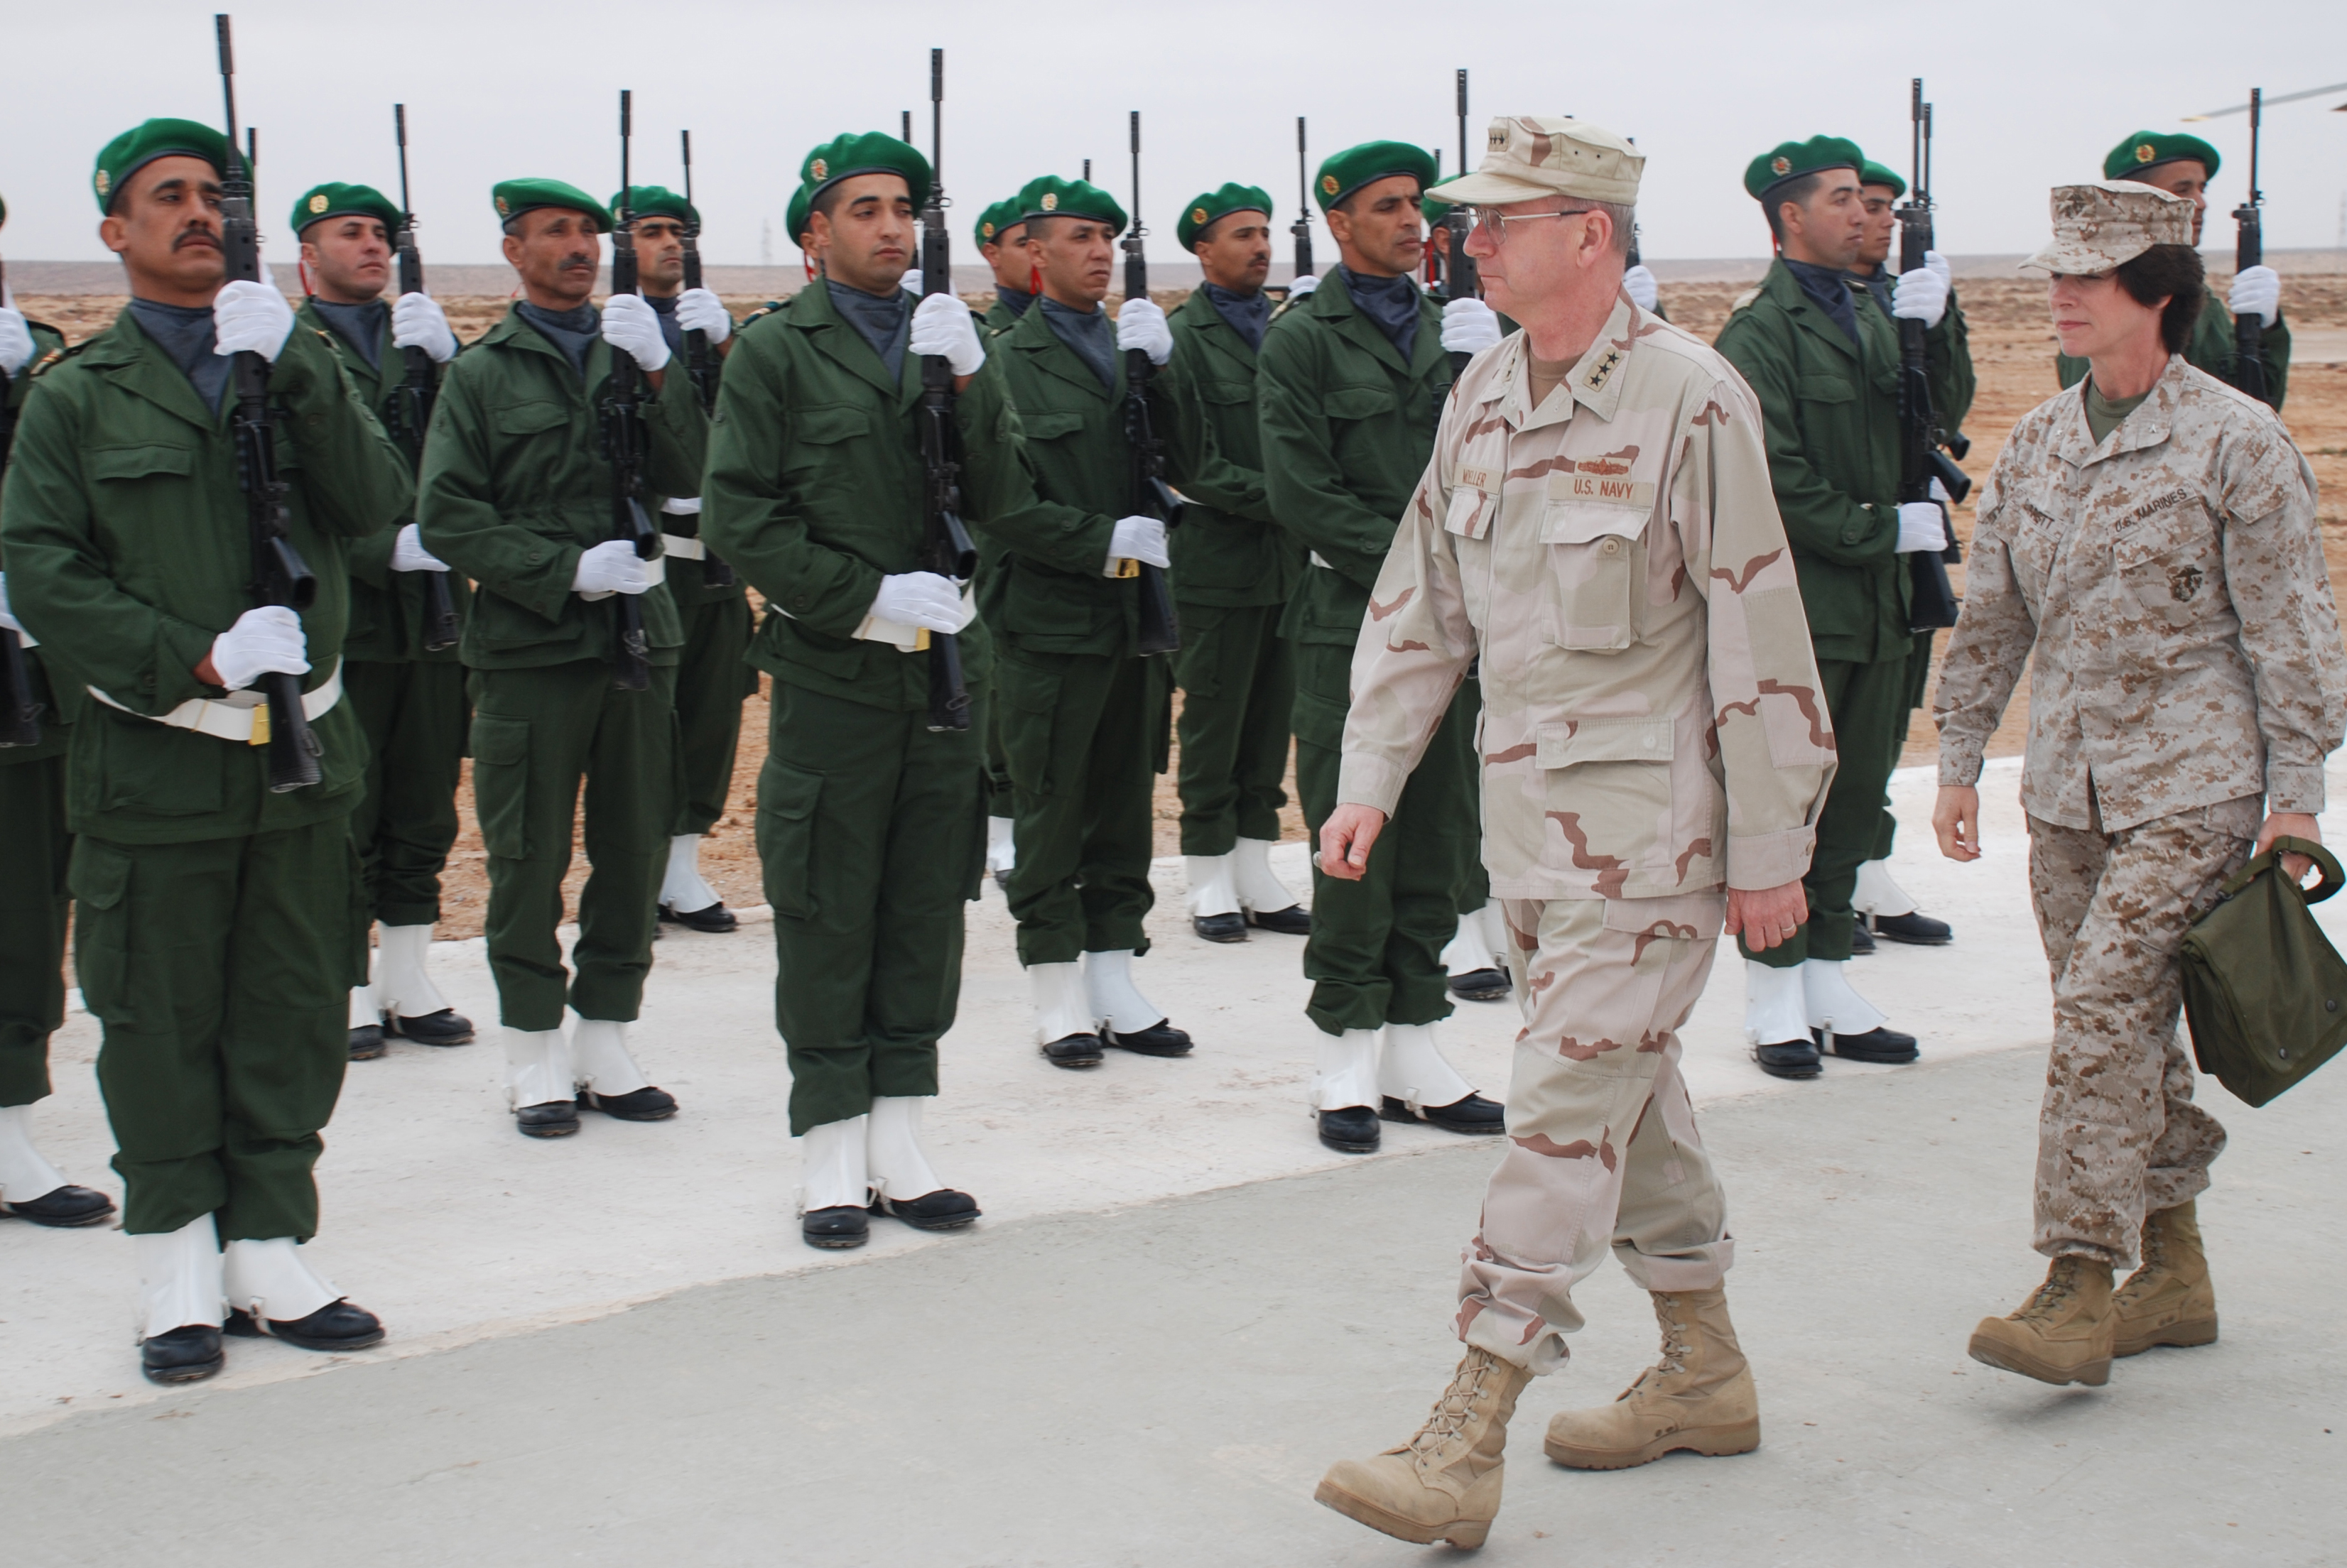 Royal Moroccan Army Military Wiki Fandom Powered By Wikia